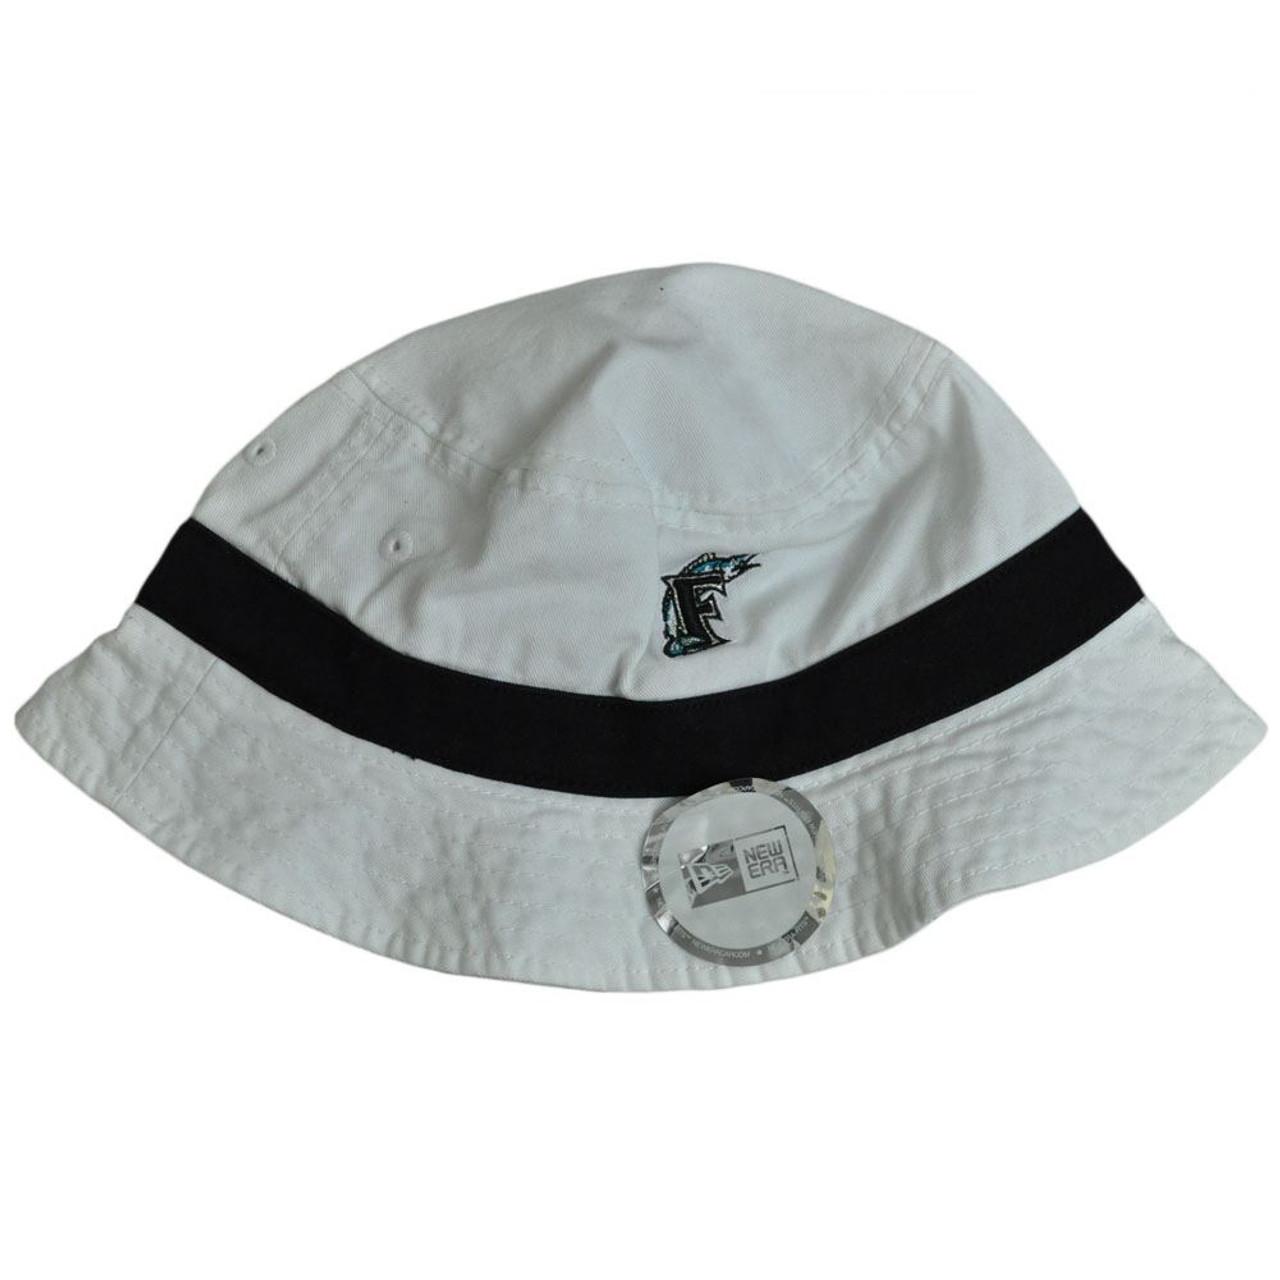 MLB Florida Marlins Baseball New Era One Size Sun Bucket Beach Hat Cap  Licensed cd7252ee5322